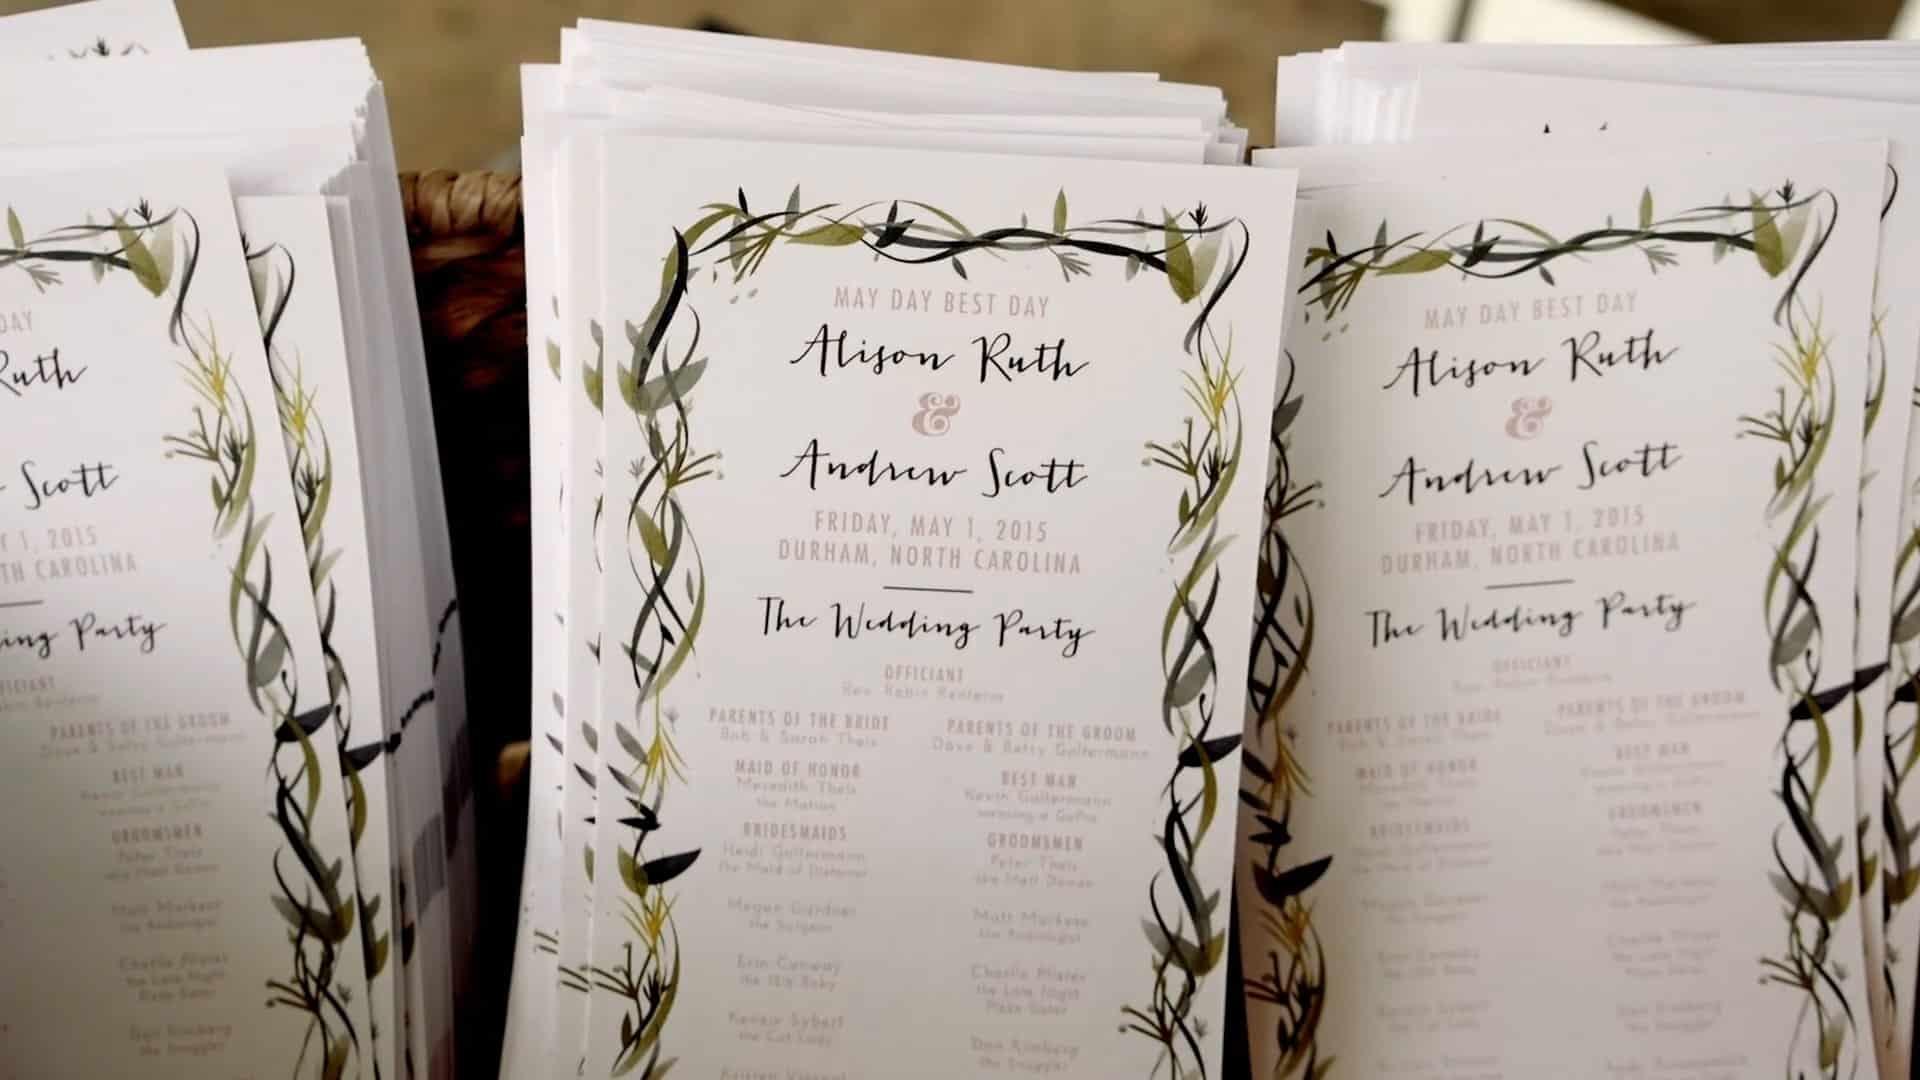 Pittsboro Wedding Video